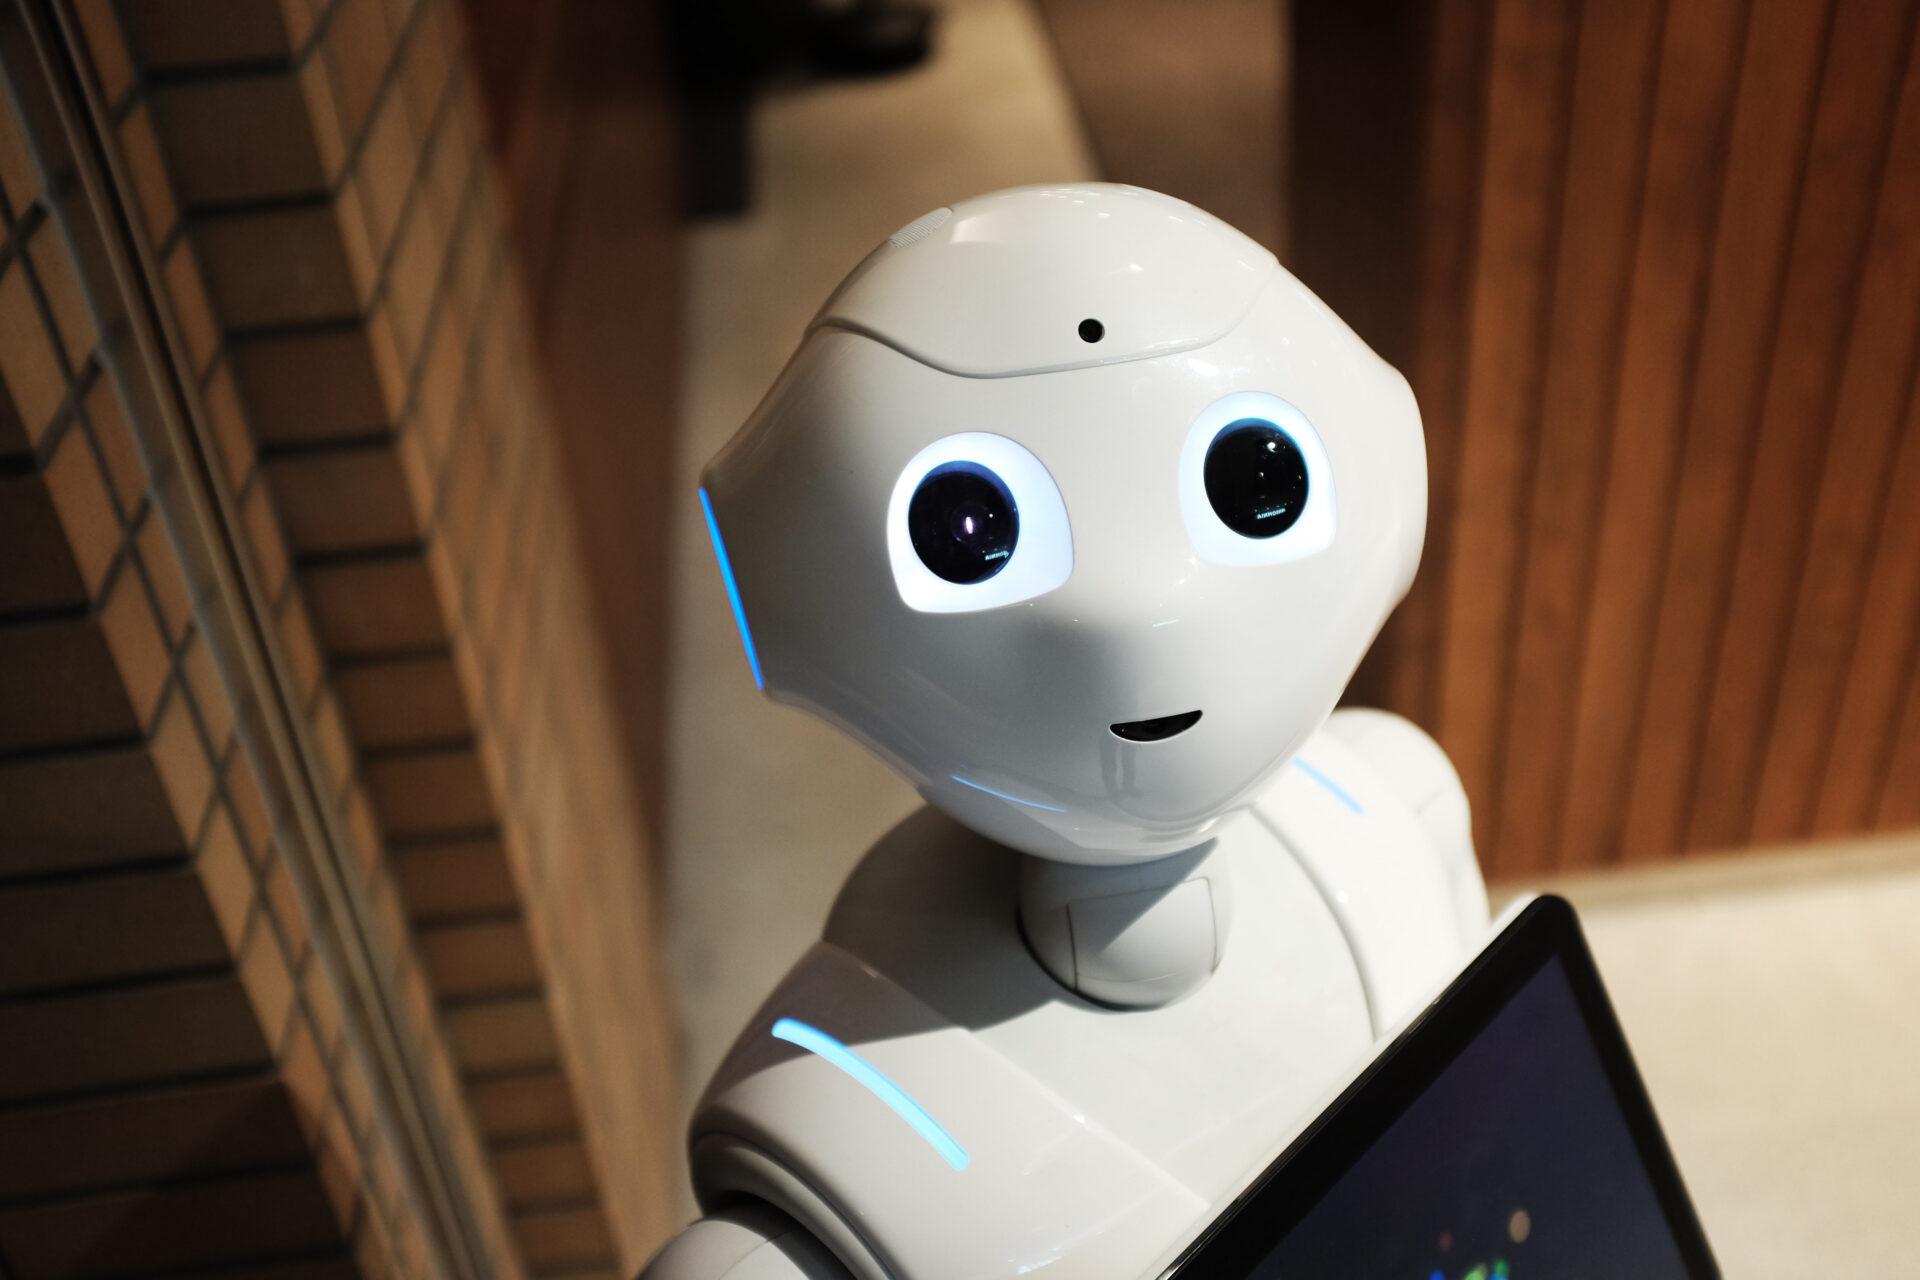 https://www.ccifrance-allemagne.fr/wp-content/uploads/2021/01/robot_humanoide-scaled.jpg